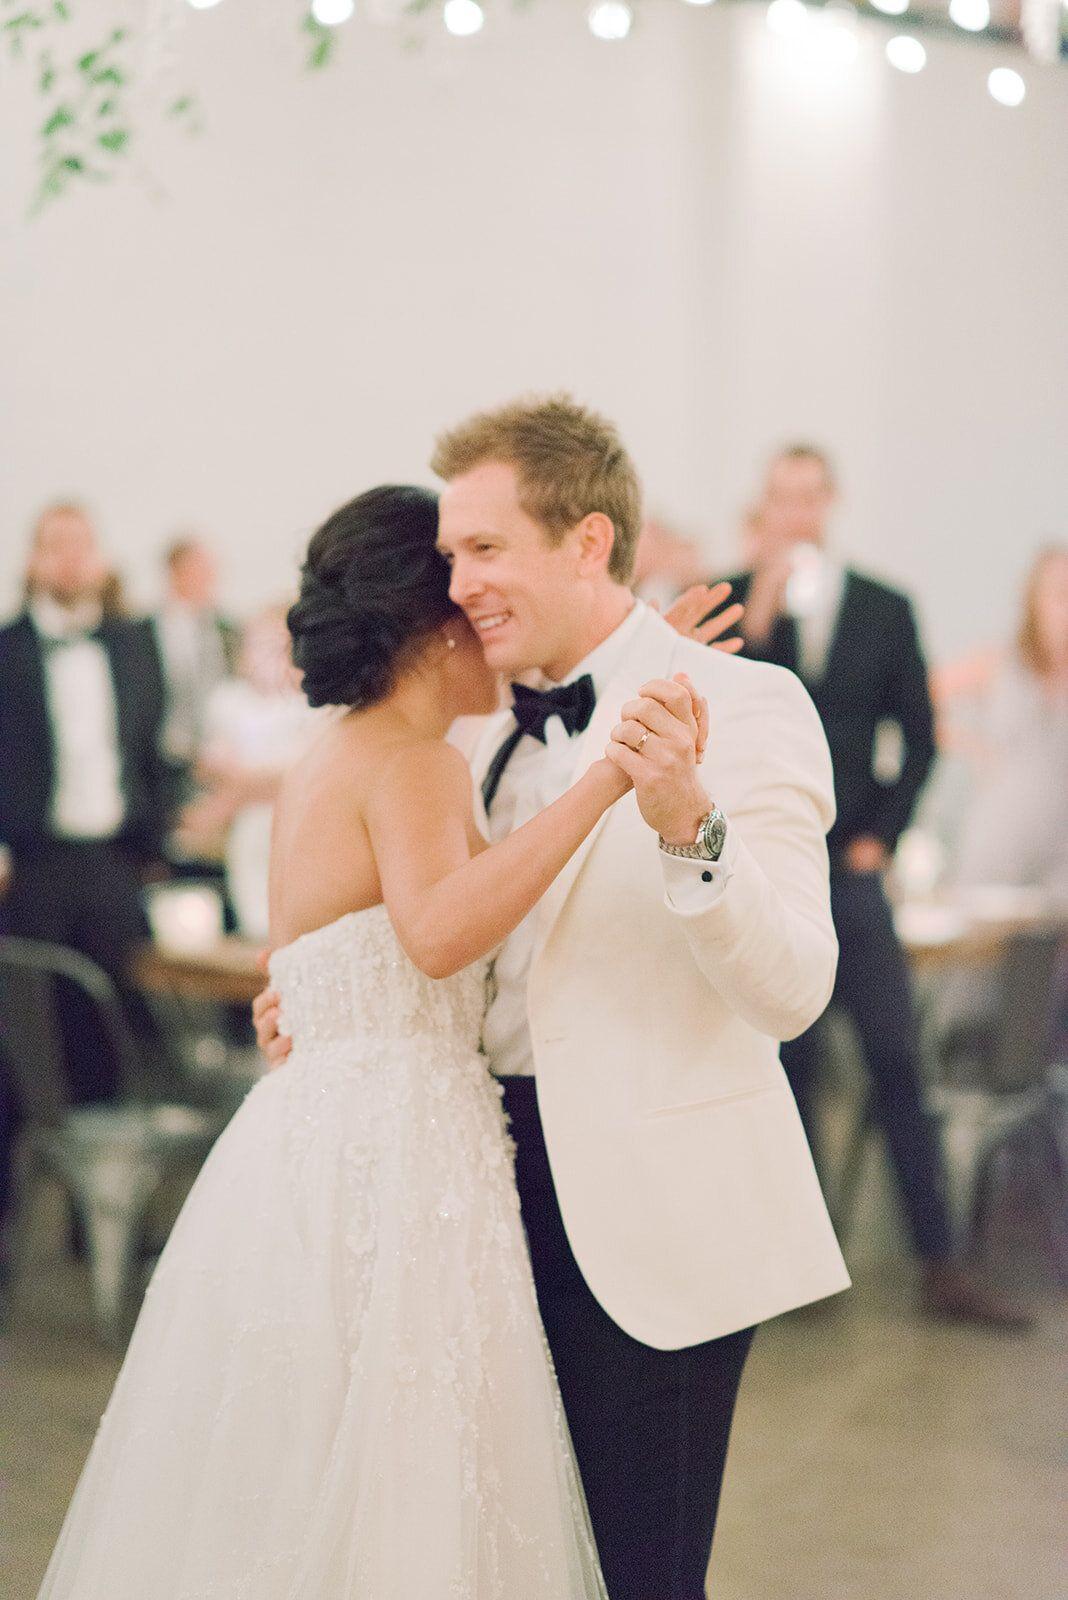 Ivy Michael S Dreamy Fall Wedding In Denver Little White Dress Bridal Shop Denver Colorado S Best Designer Wedding Dresses And Accessories White Bridal Dresses Wedding Dresses Designer Wedding Dresses [ 1600 x 1068 Pixel ]